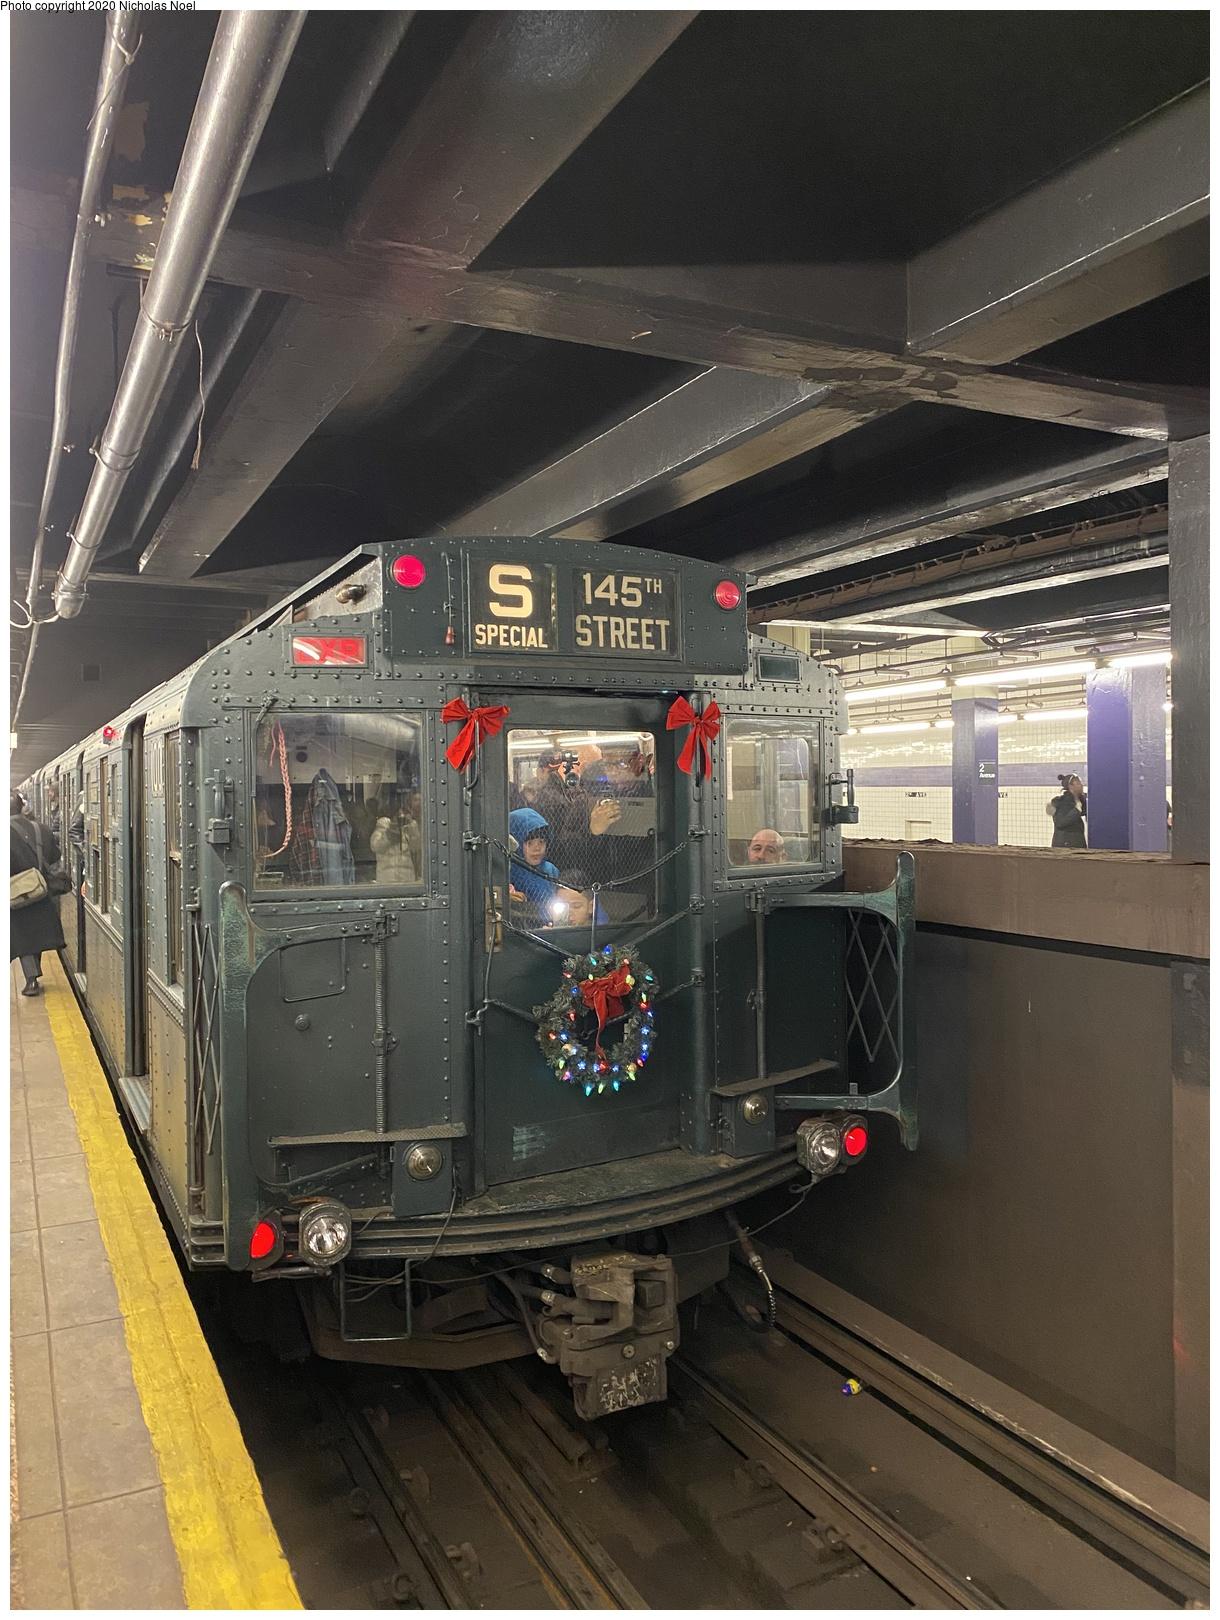 (724k, 1220x1620)<br><b>Country:</b> United States<br><b>City:</b> New York<br><b>System:</b> New York City Transit<br><b>Line:</b> IND 6th Avenue Line<br><b>Location:</b> 2nd Avenue<br><b>Route:</b> Museum Train Service<br><b>Car:</b> R-1 (American Car & Foundry, 1930-1931) 100 <br><b>Photo by:</b> Nicholas Noel<br><b>Date:</b> 12/22/2019<br><b>Viewed (this week/total):</b> 0 / 321